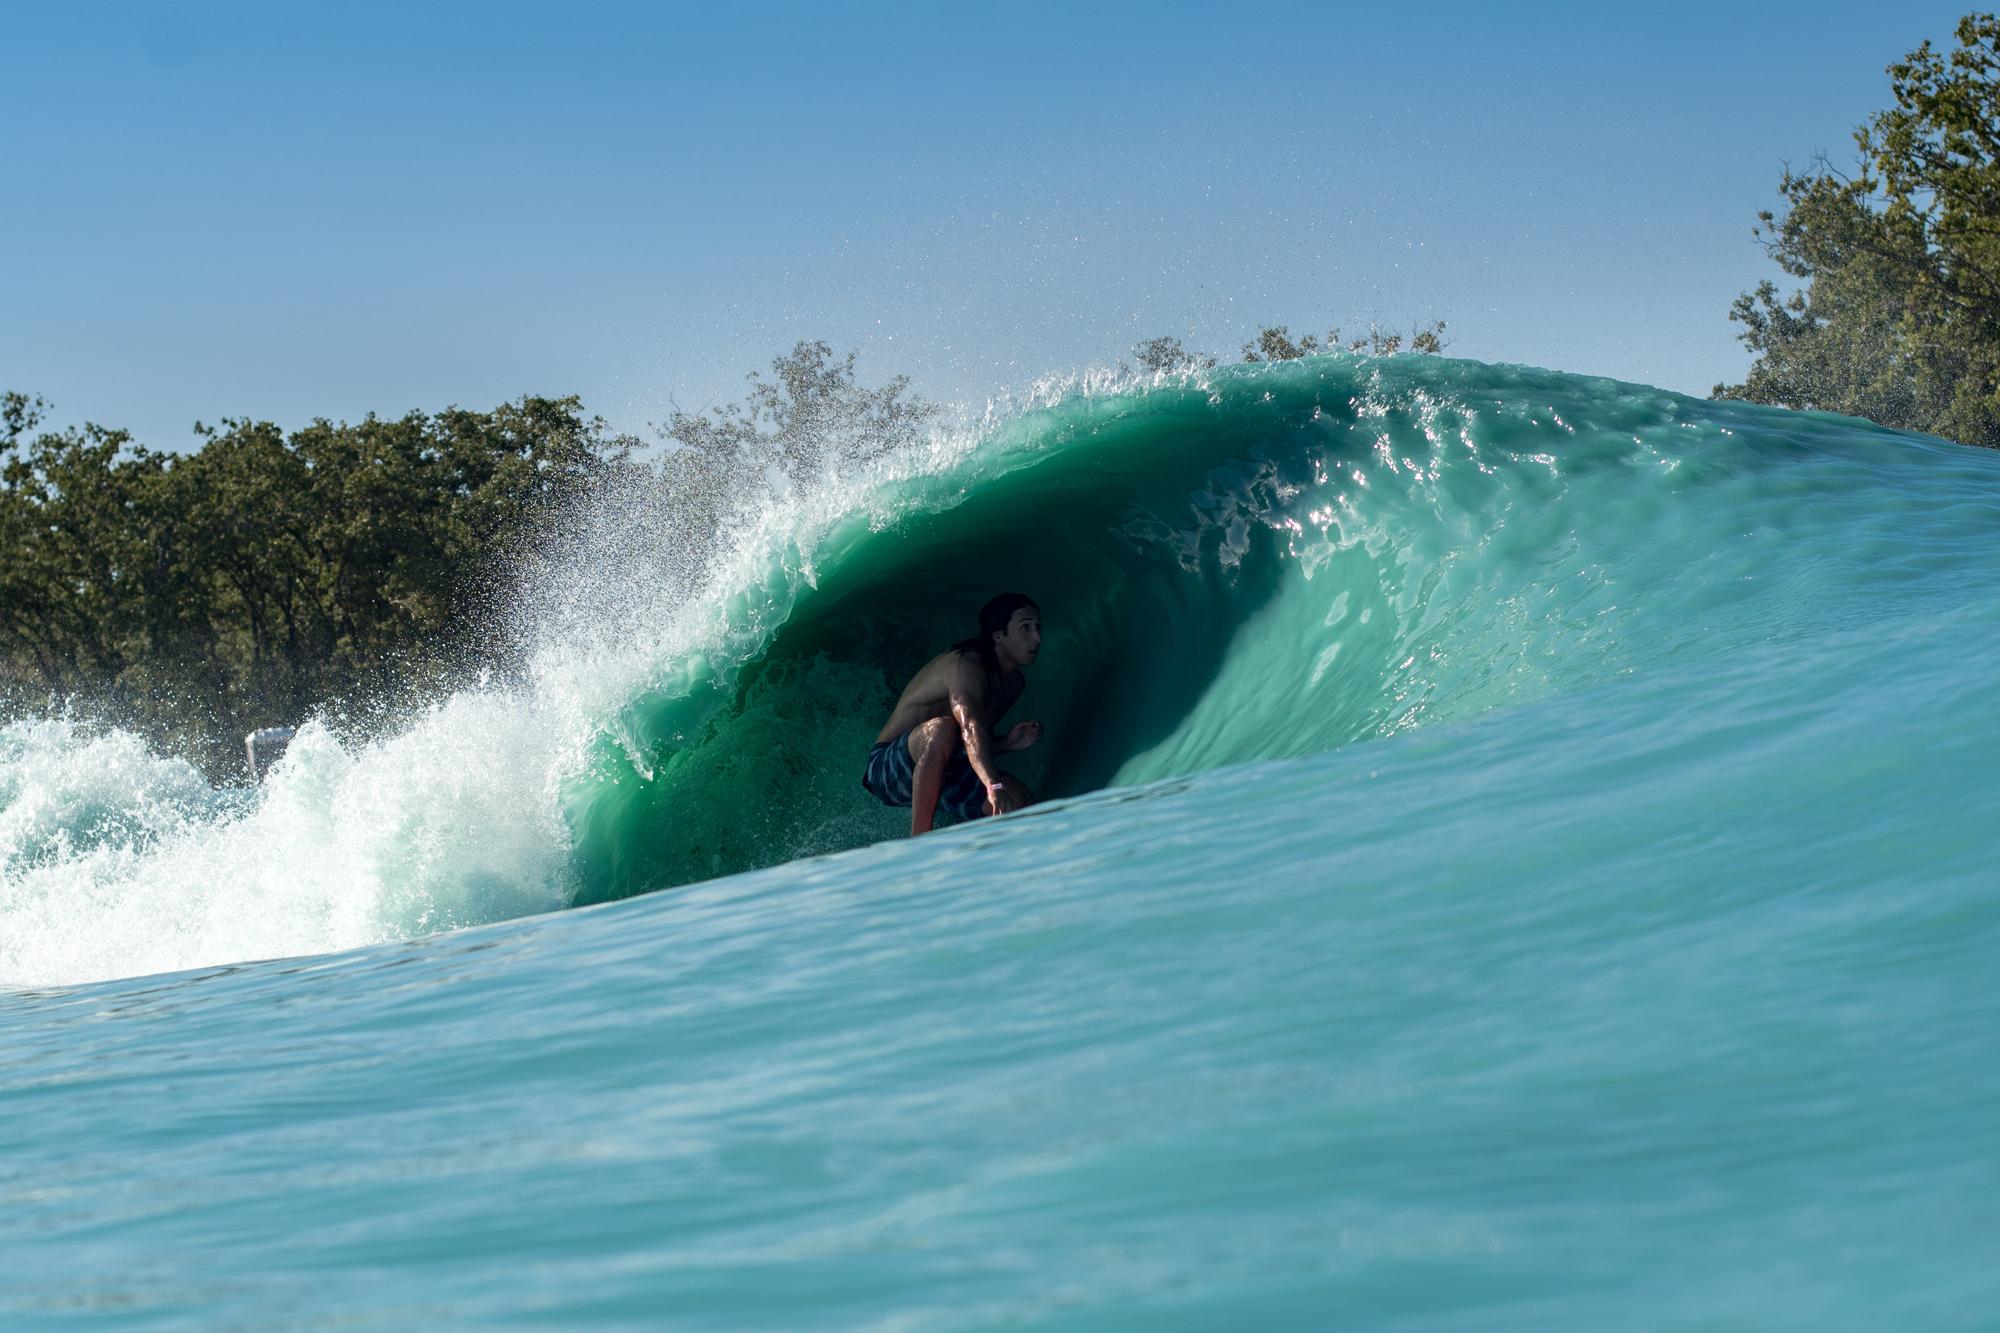 BSR Surf Resort Reopens March 22 - Surfline